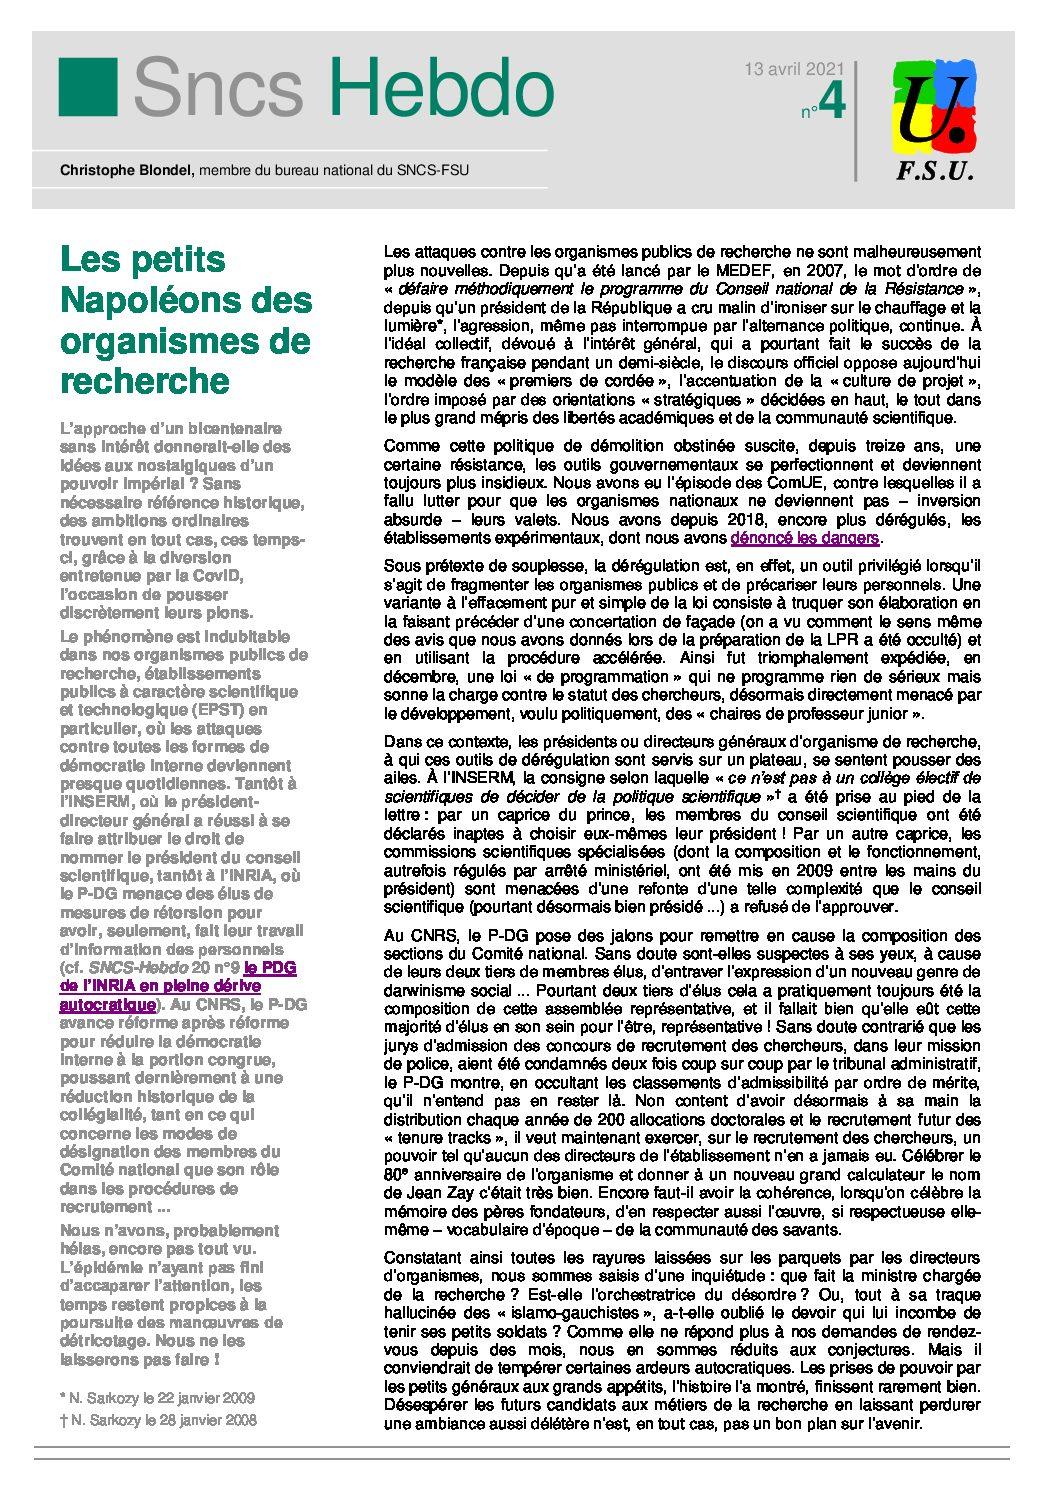 SNCSHebdo21N°4-3-pdf.jpg